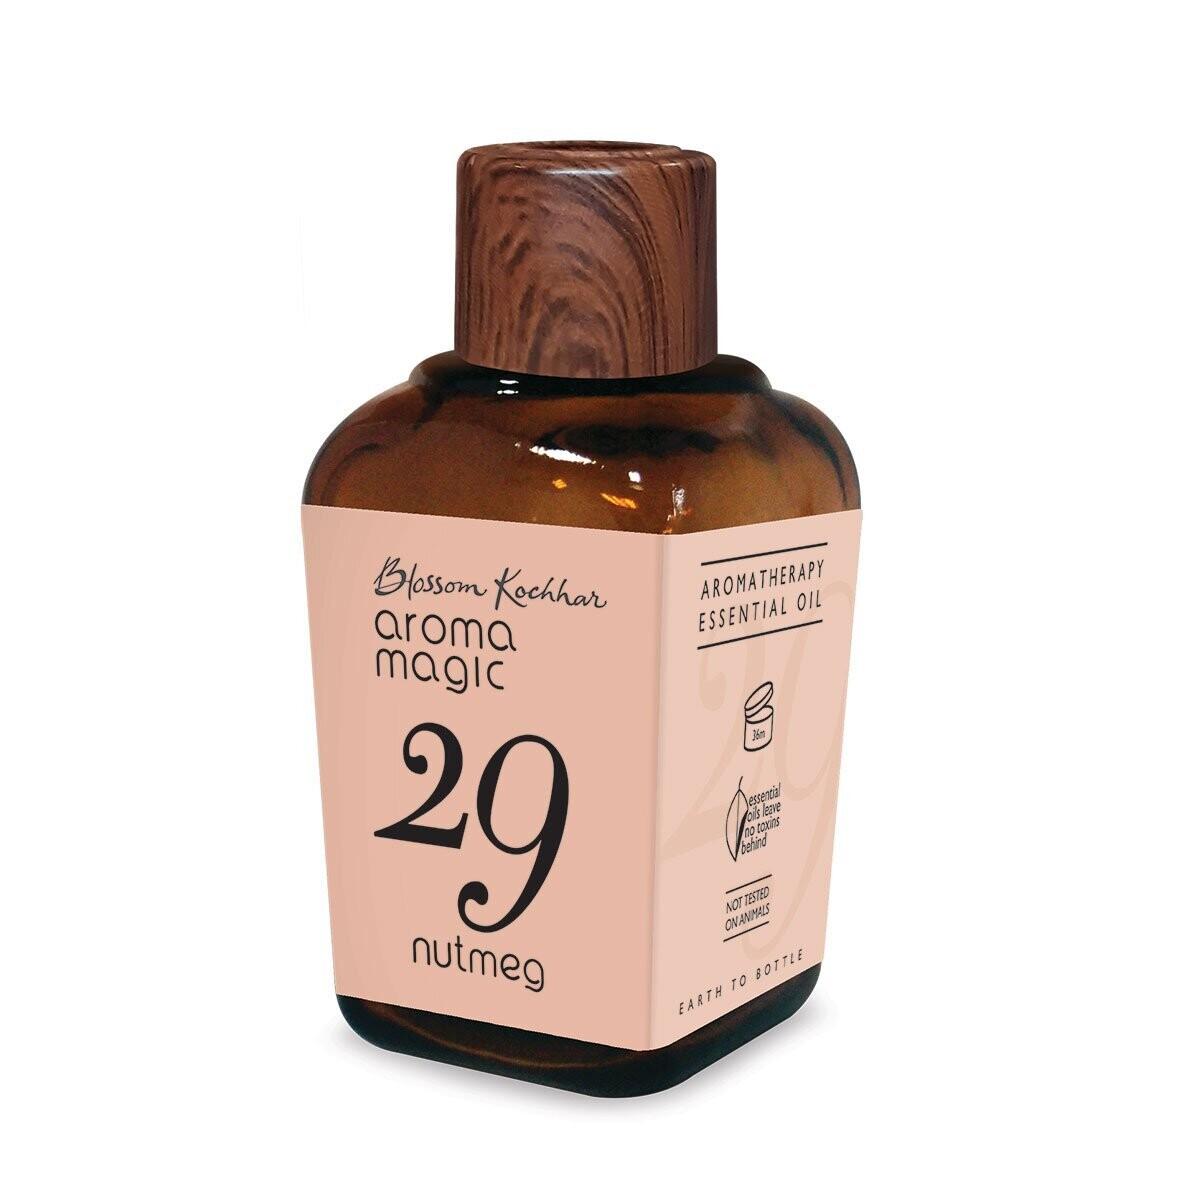 Aroma Magic 29 Nutmeg Oil 20 Ml